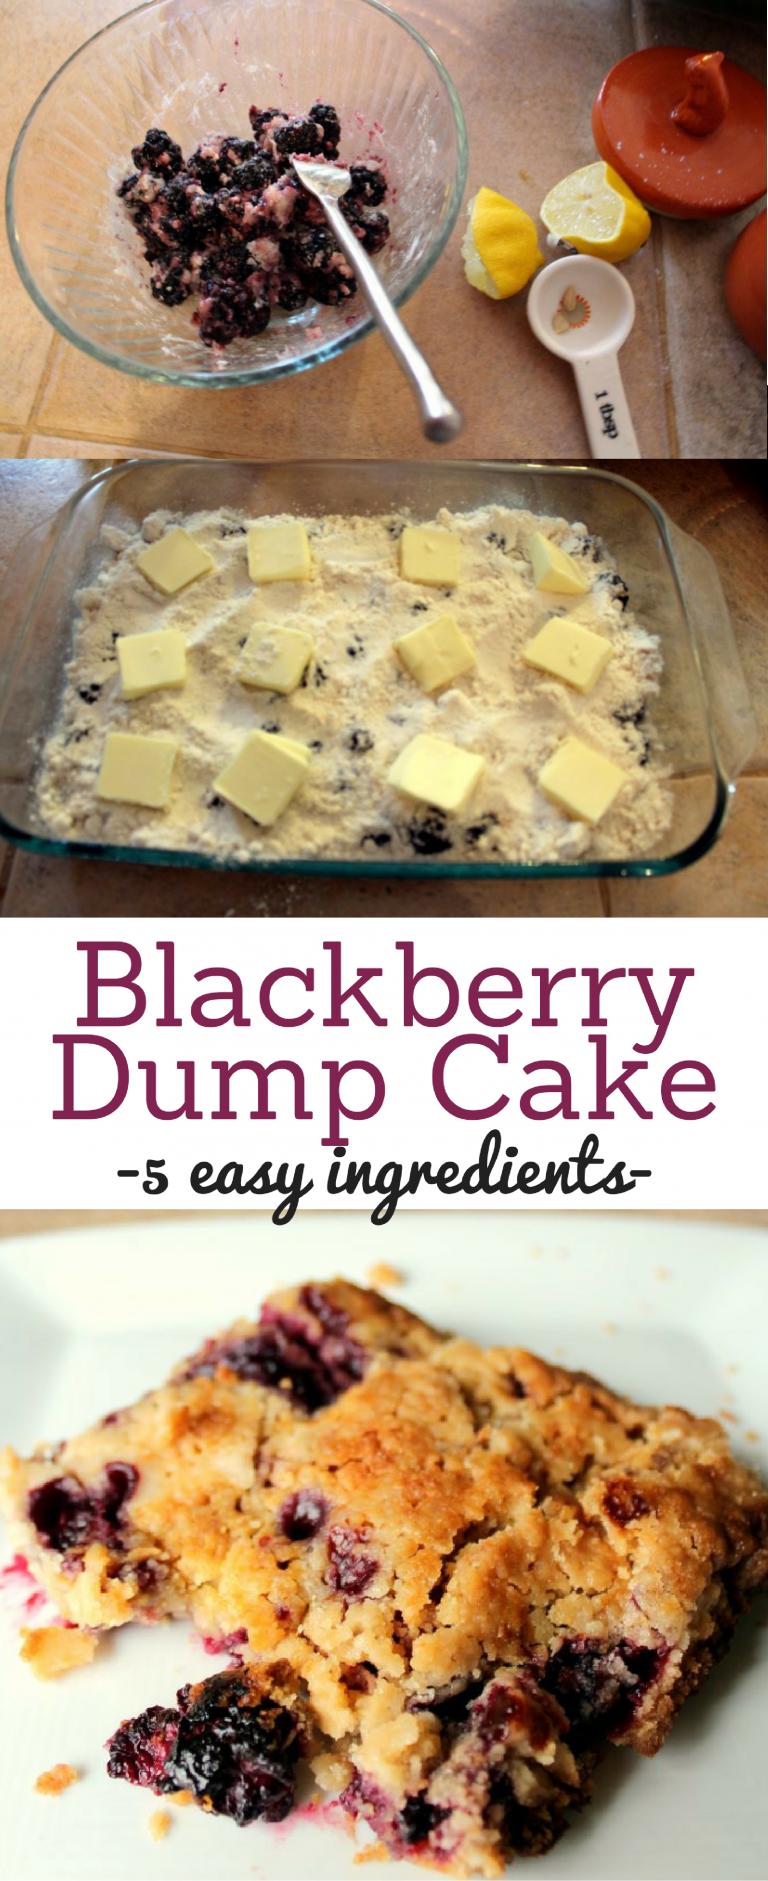 Blackberry Dump Cake - Blackberry Cobber with Cake Mix Recipe